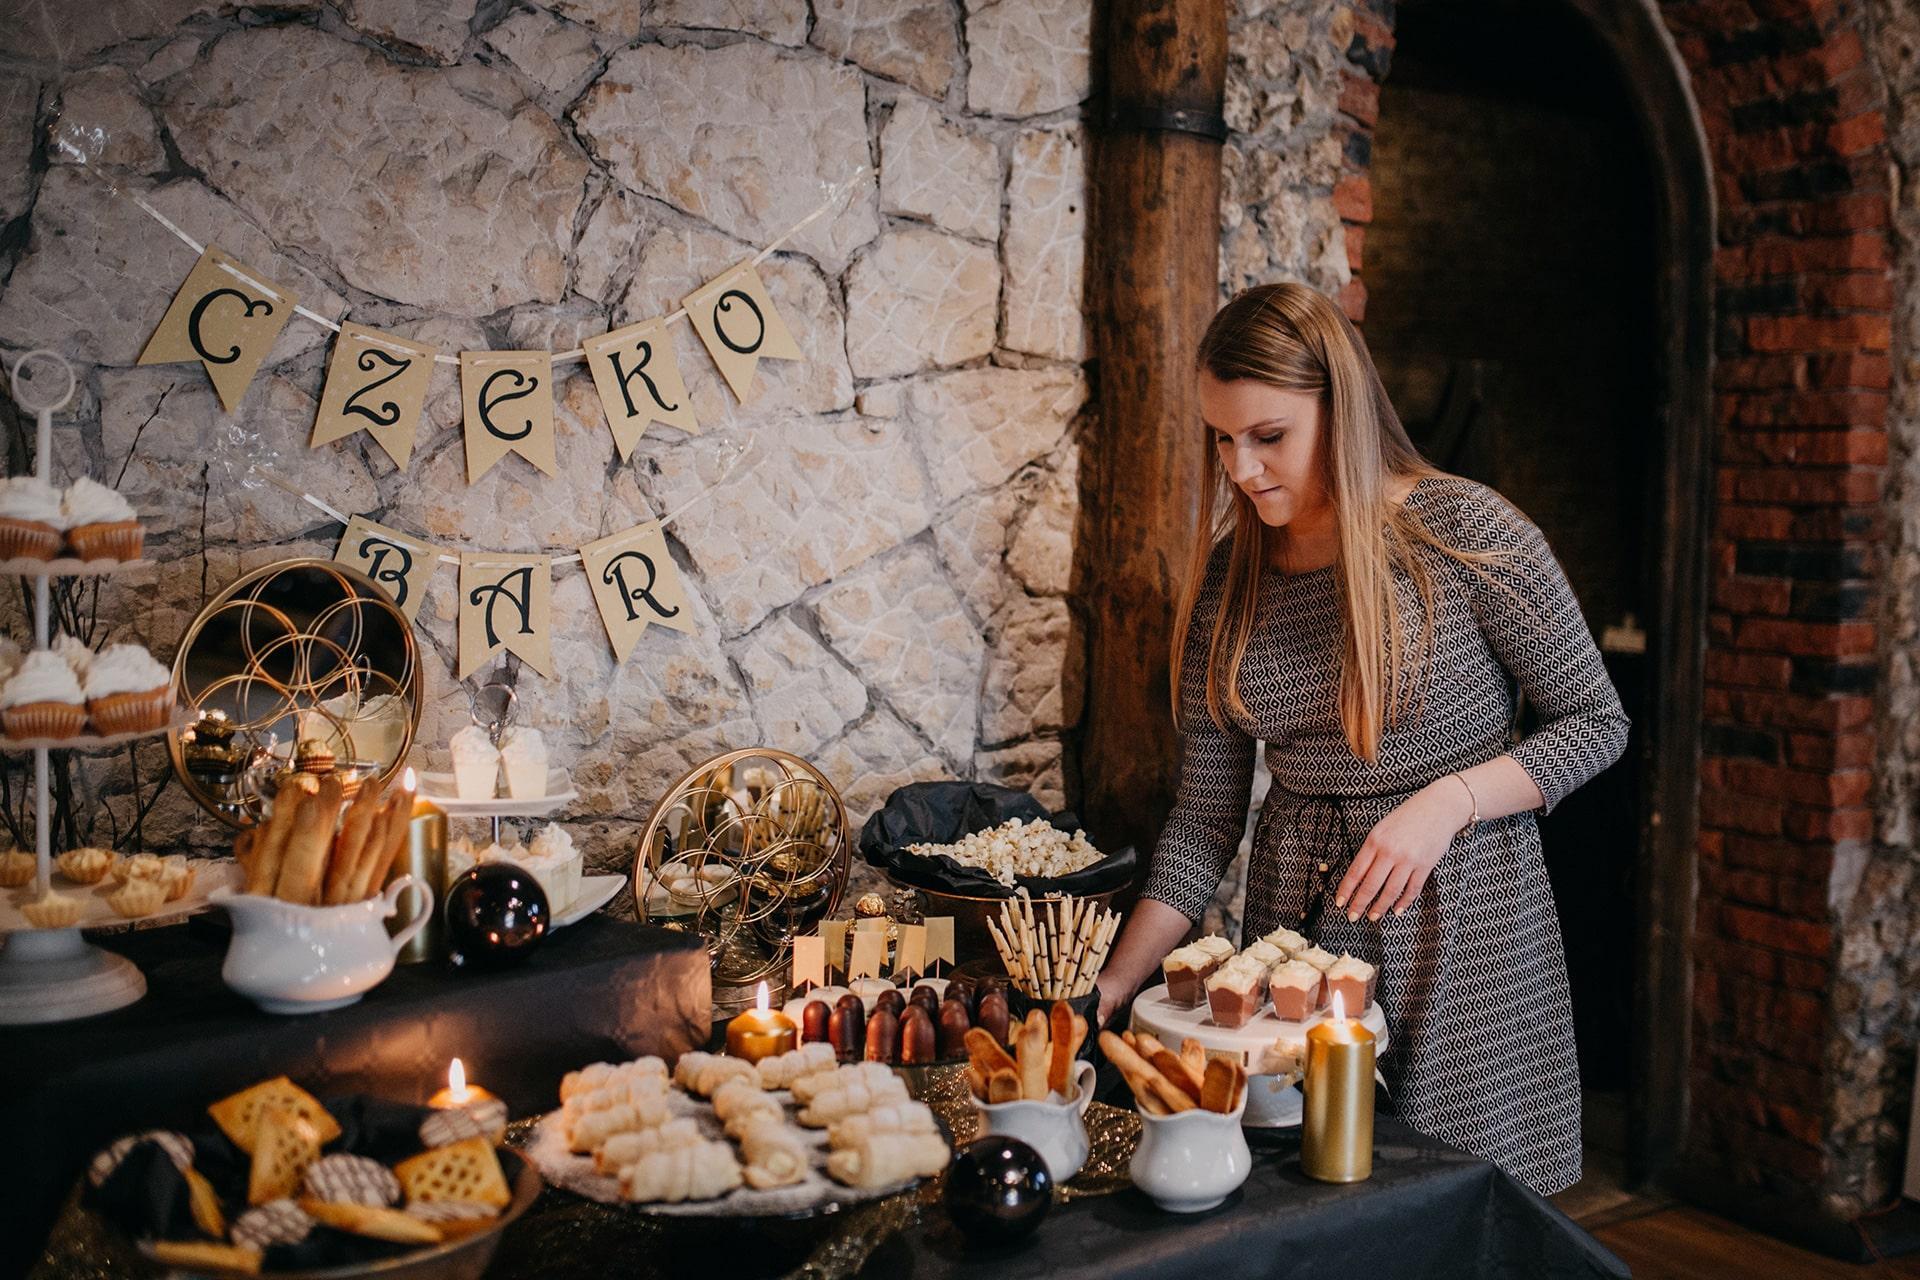 WeddingLand - Kamila Plesińska